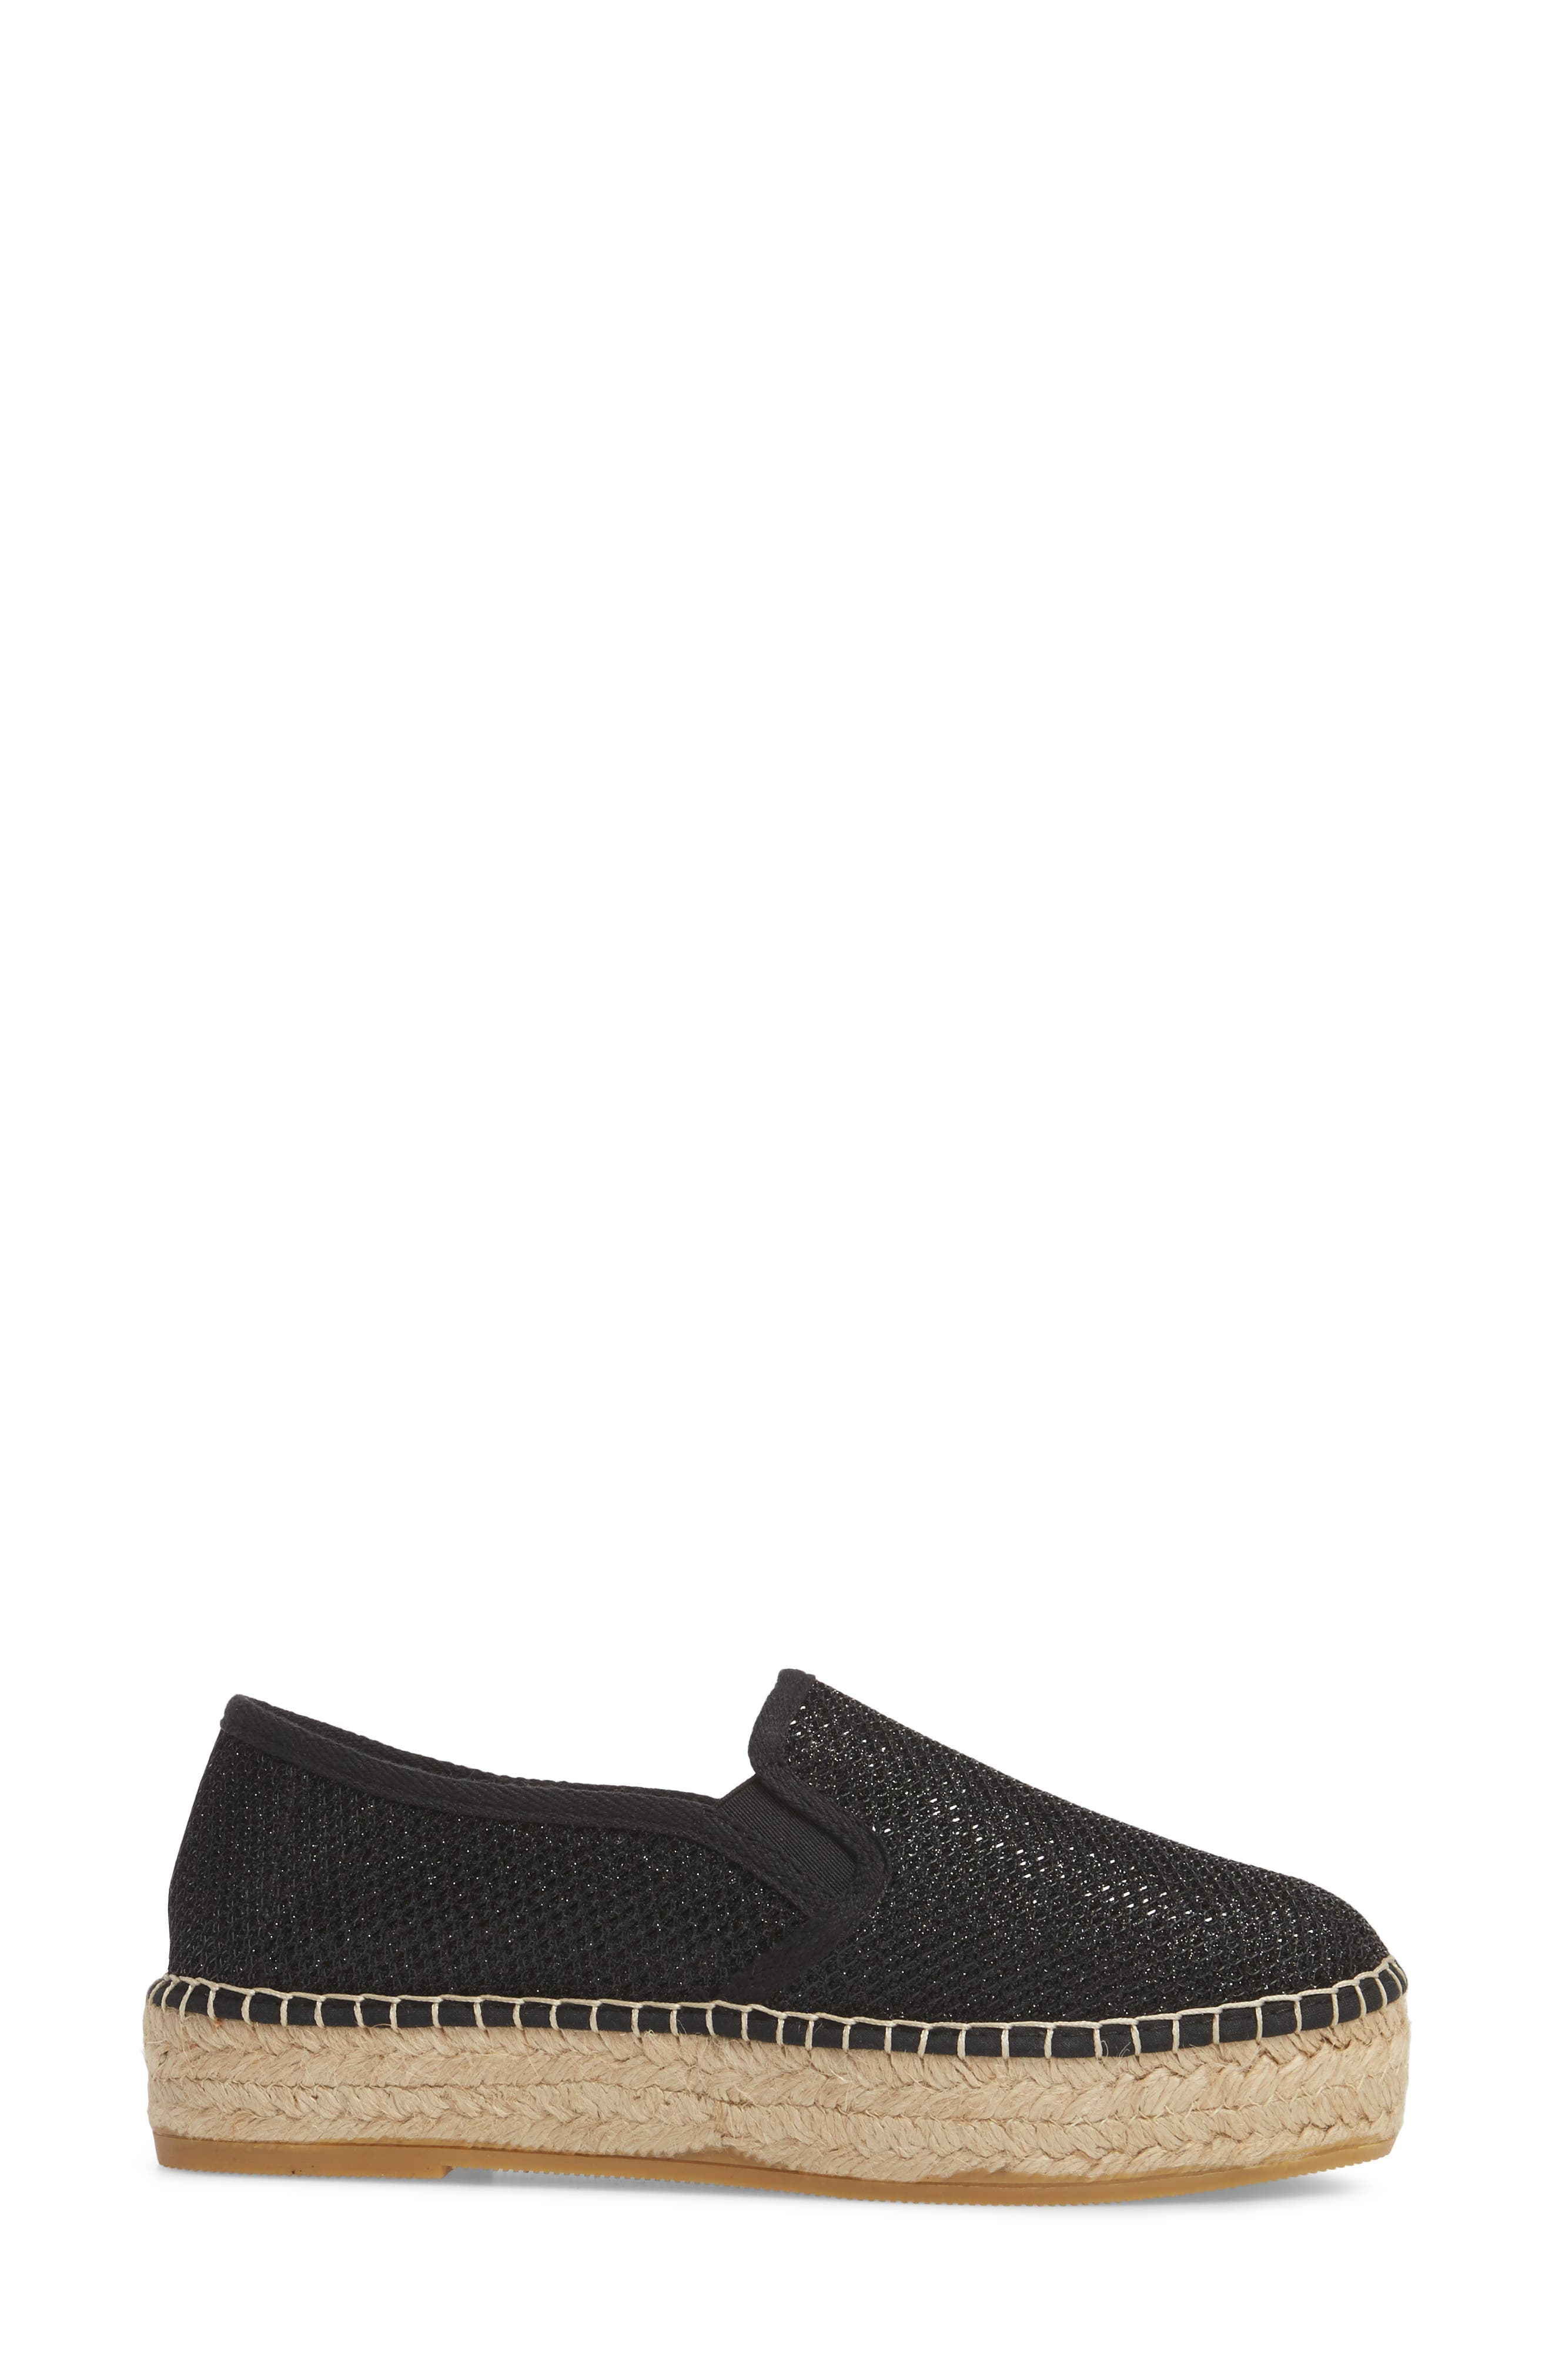 Fonda Platform Espadrille Sneaker,                             Alternate thumbnail 3, color,                             BLACK FABRIC